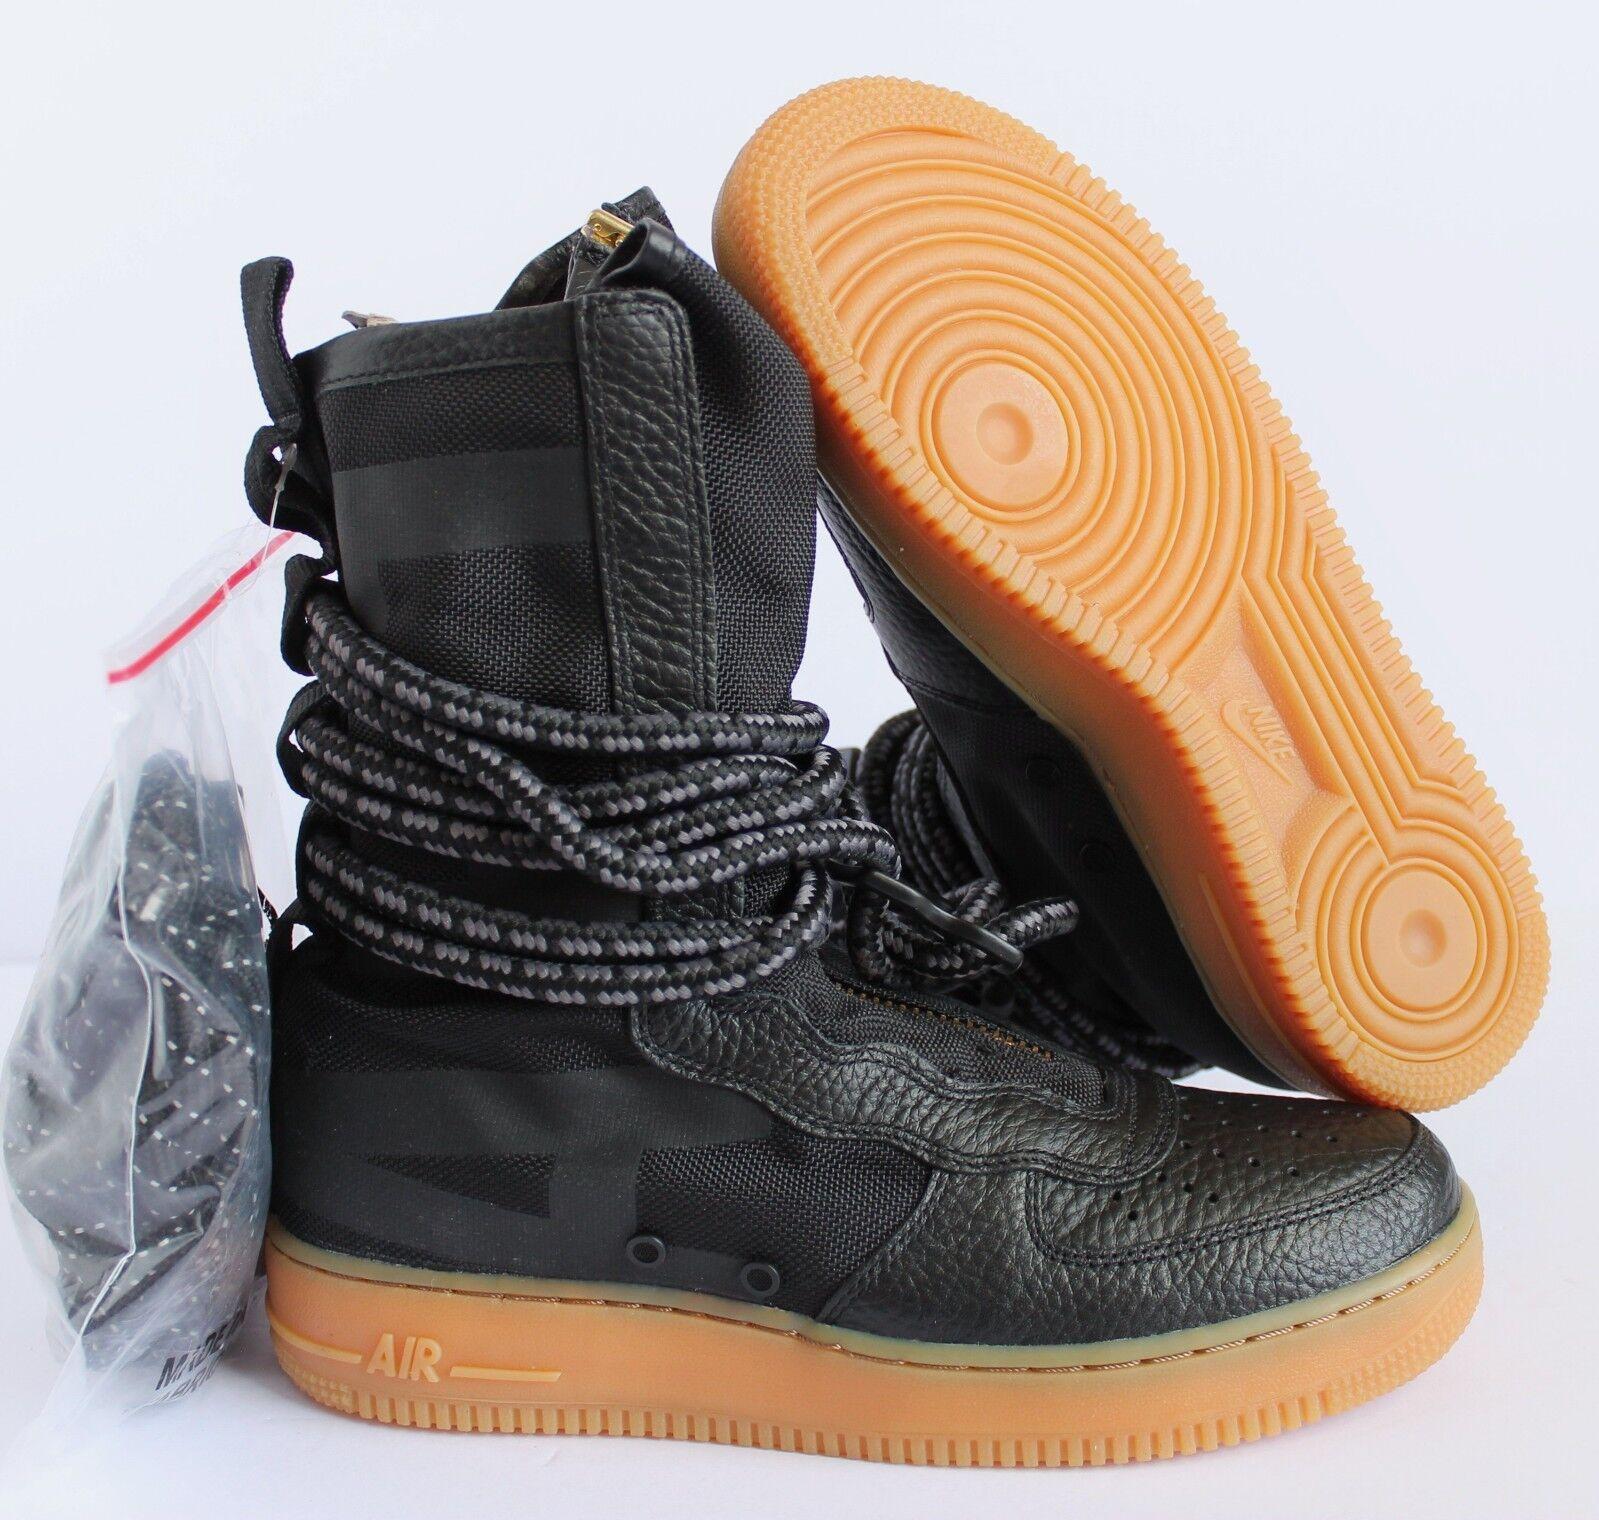 Nike air force 1 sf af1 af1 sf hi spezialgebiet schwarz-gum sz 8,5 [aa1128-001] f675c4